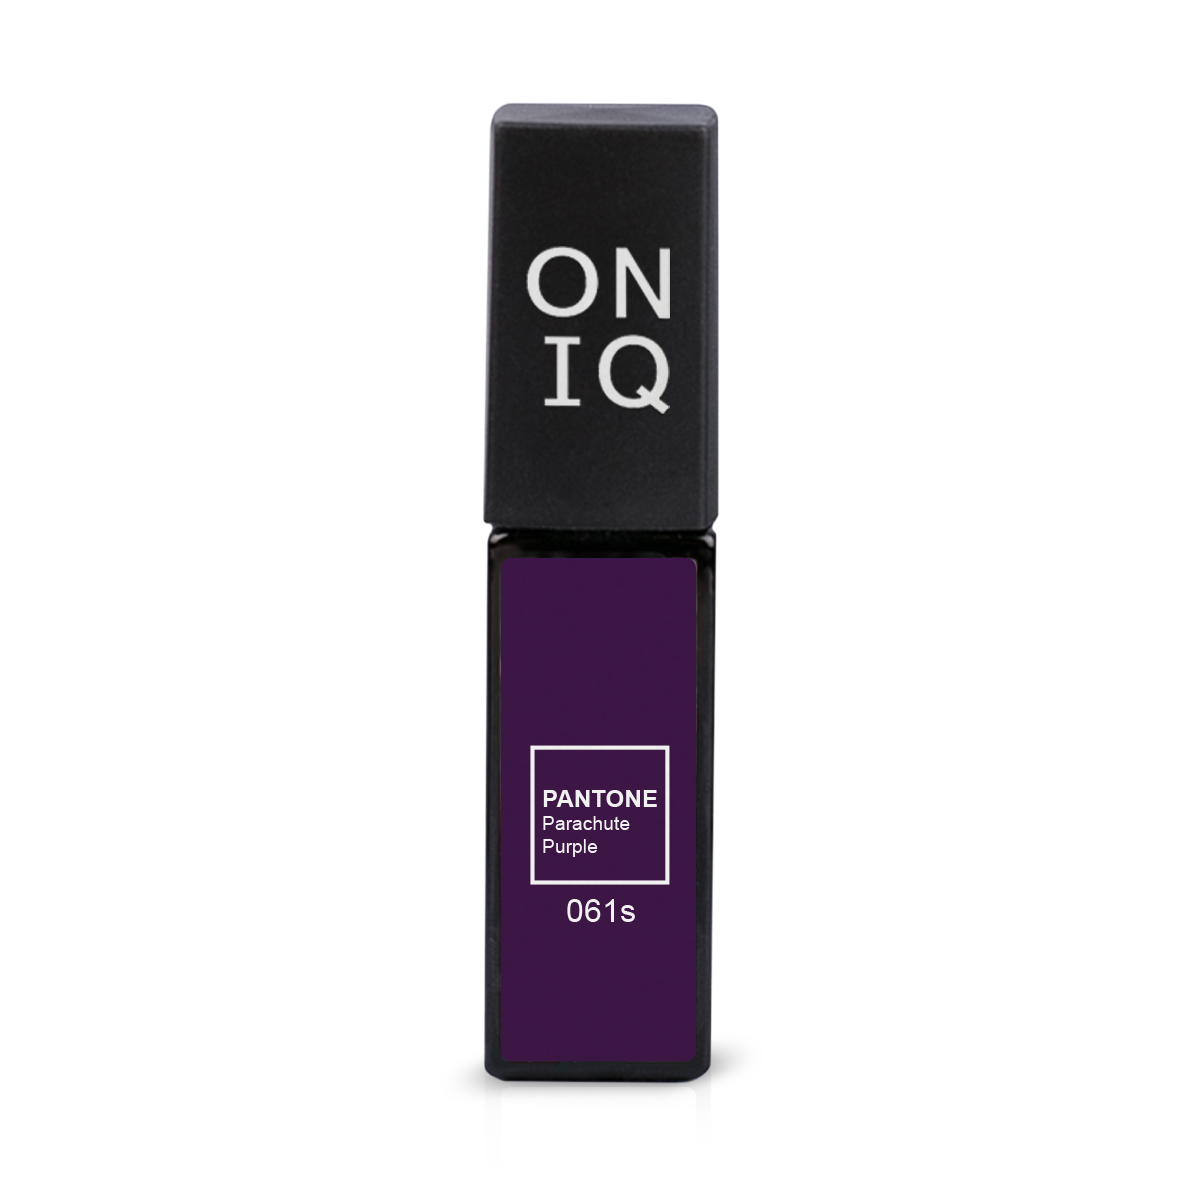 ONIQ Гель-лак для покрытия ногтей, Pantone: Parachute Purple, 6 мл